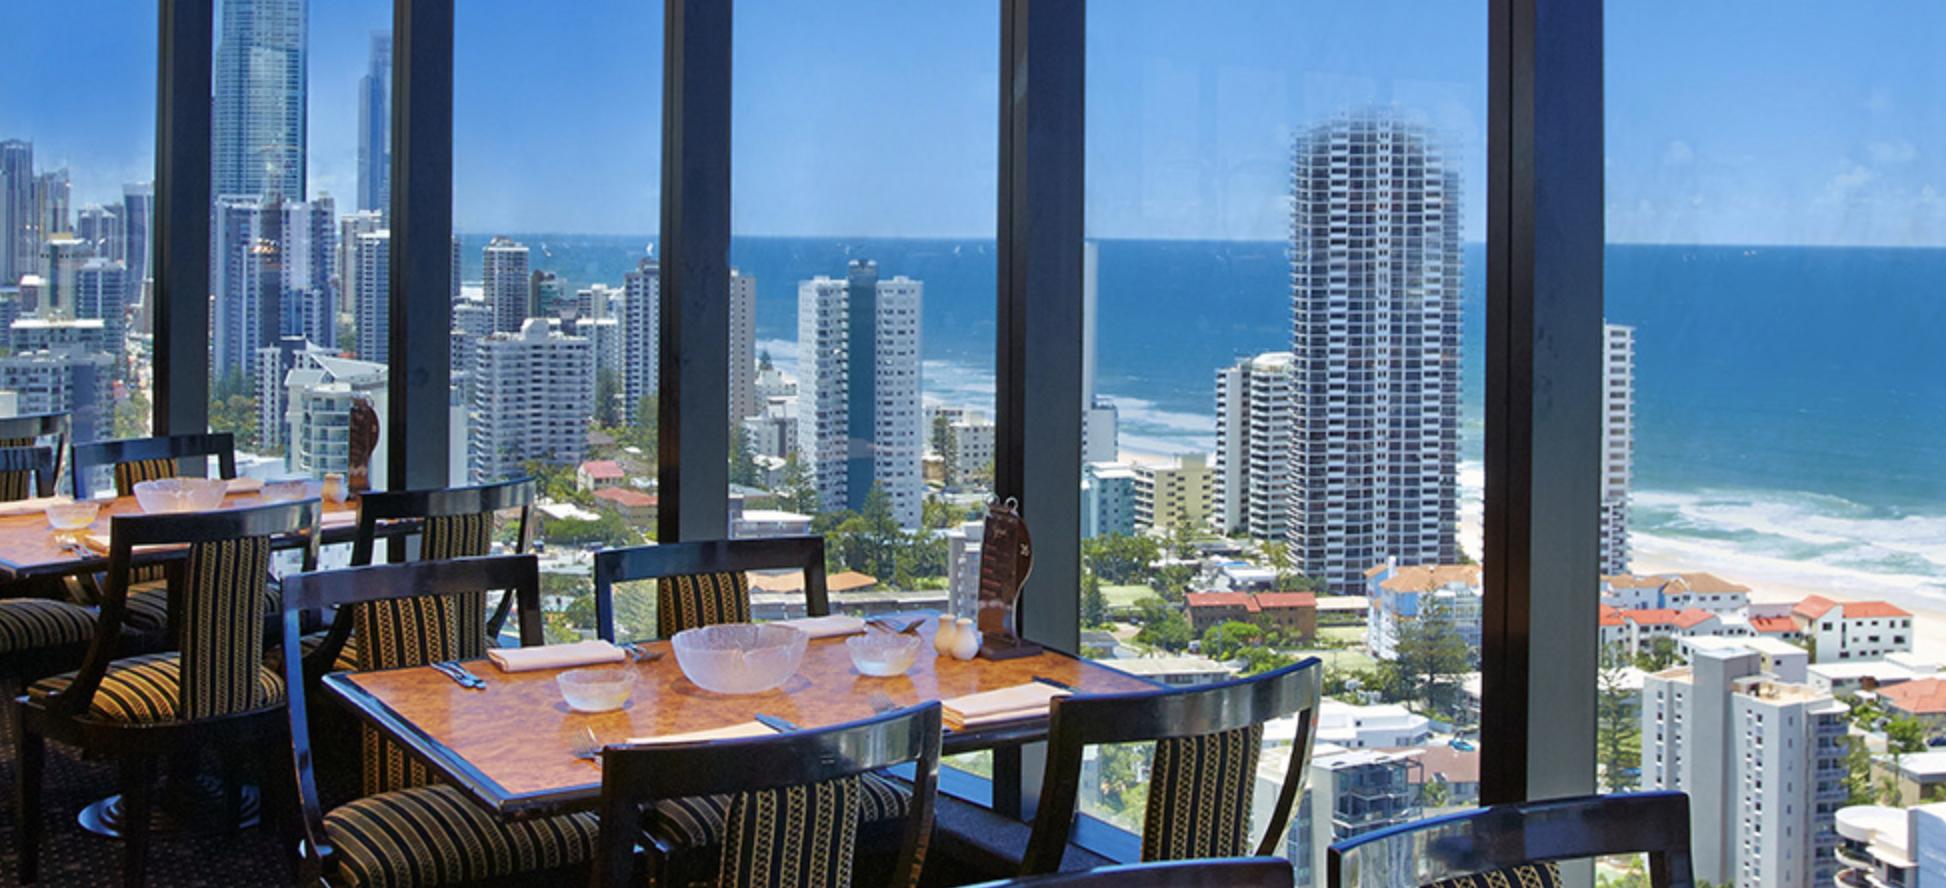 20+ Best Romantic Restaurants in the Gold Coast